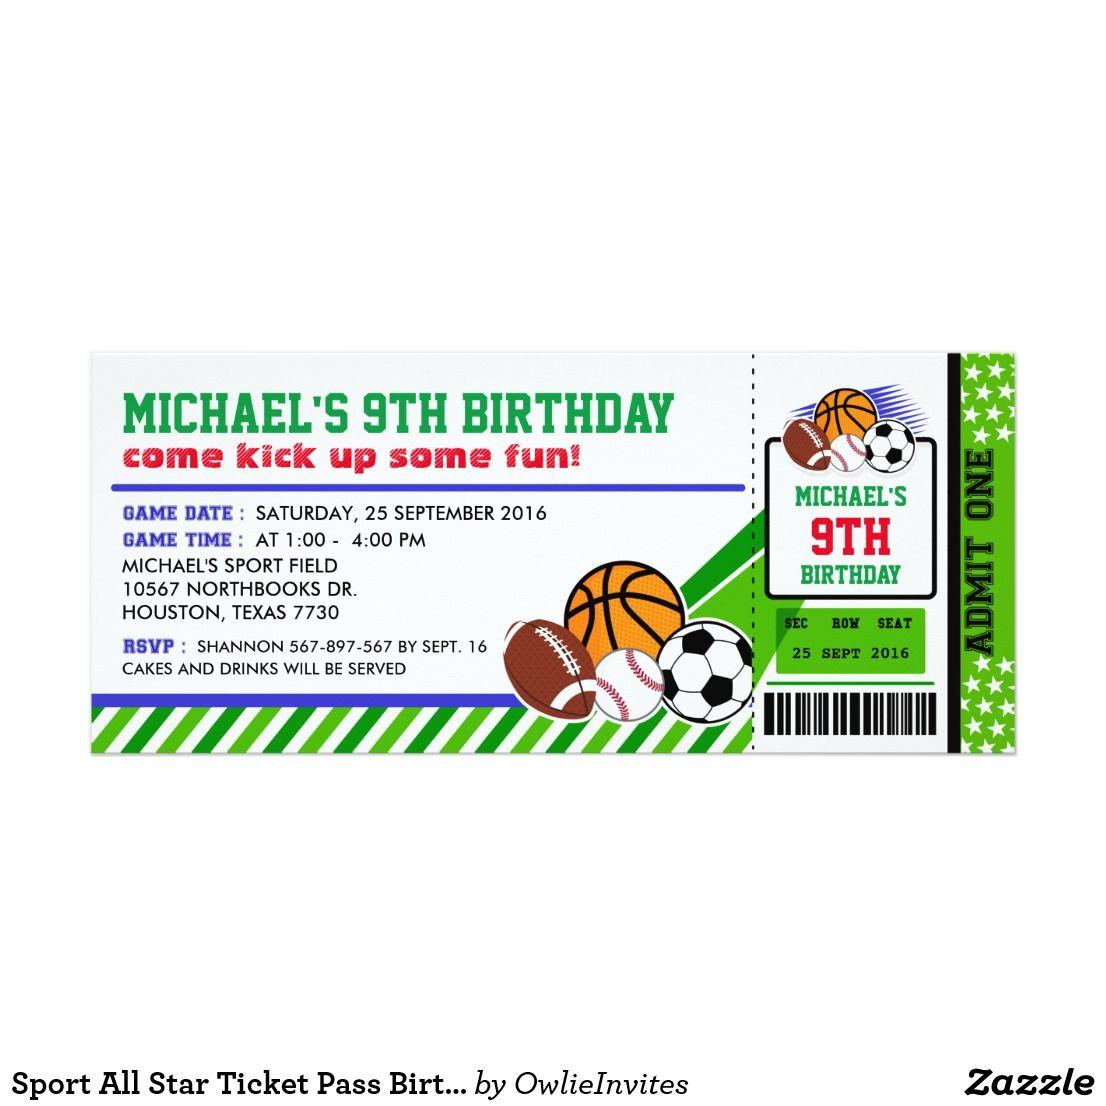 Sport All Star Ticket Pass Birthday Invitation Come kick up some FUN ...